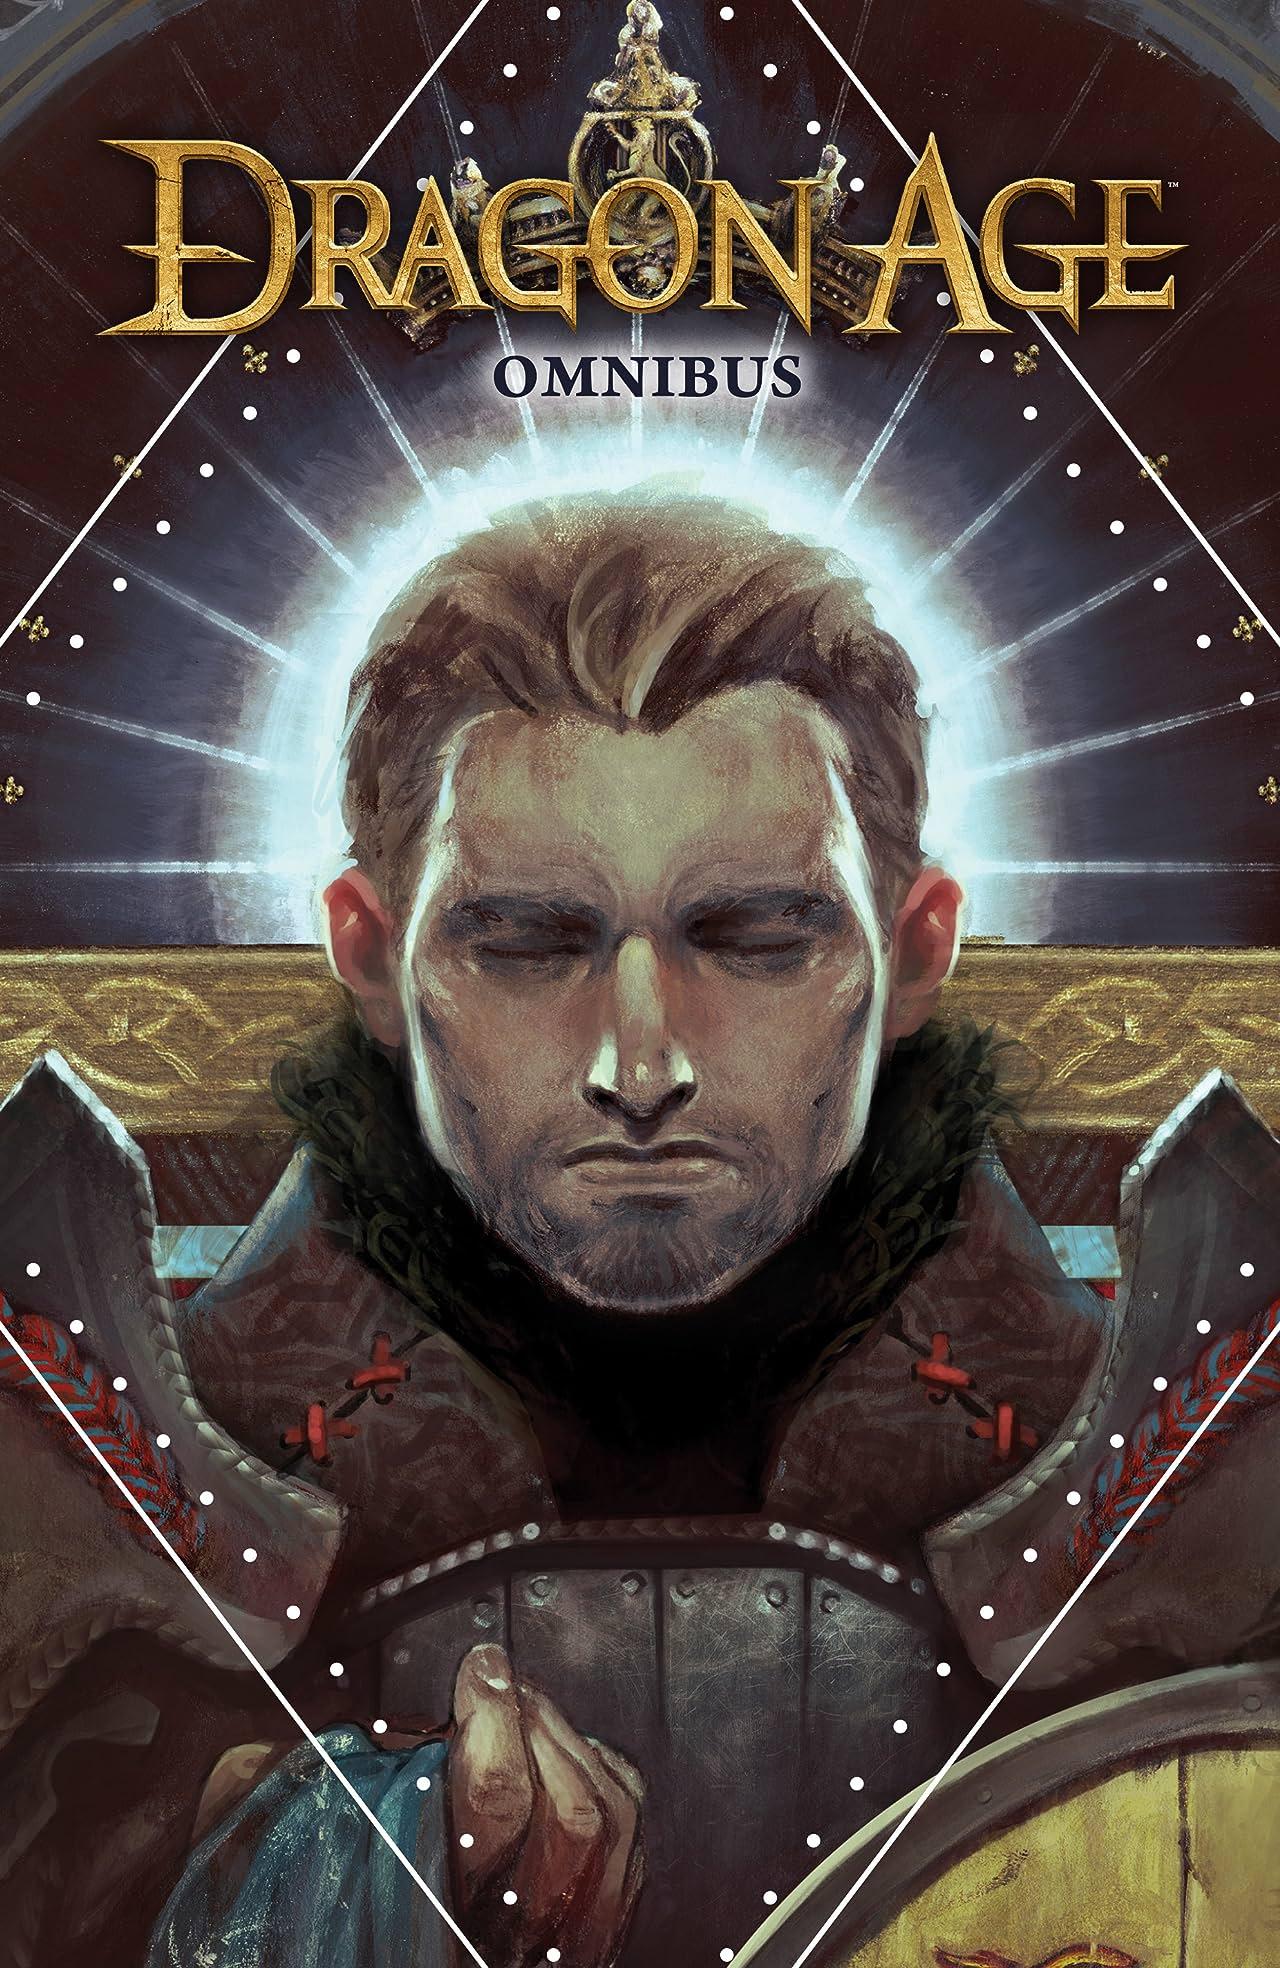 Dragon Age Omnibus Vol. 1